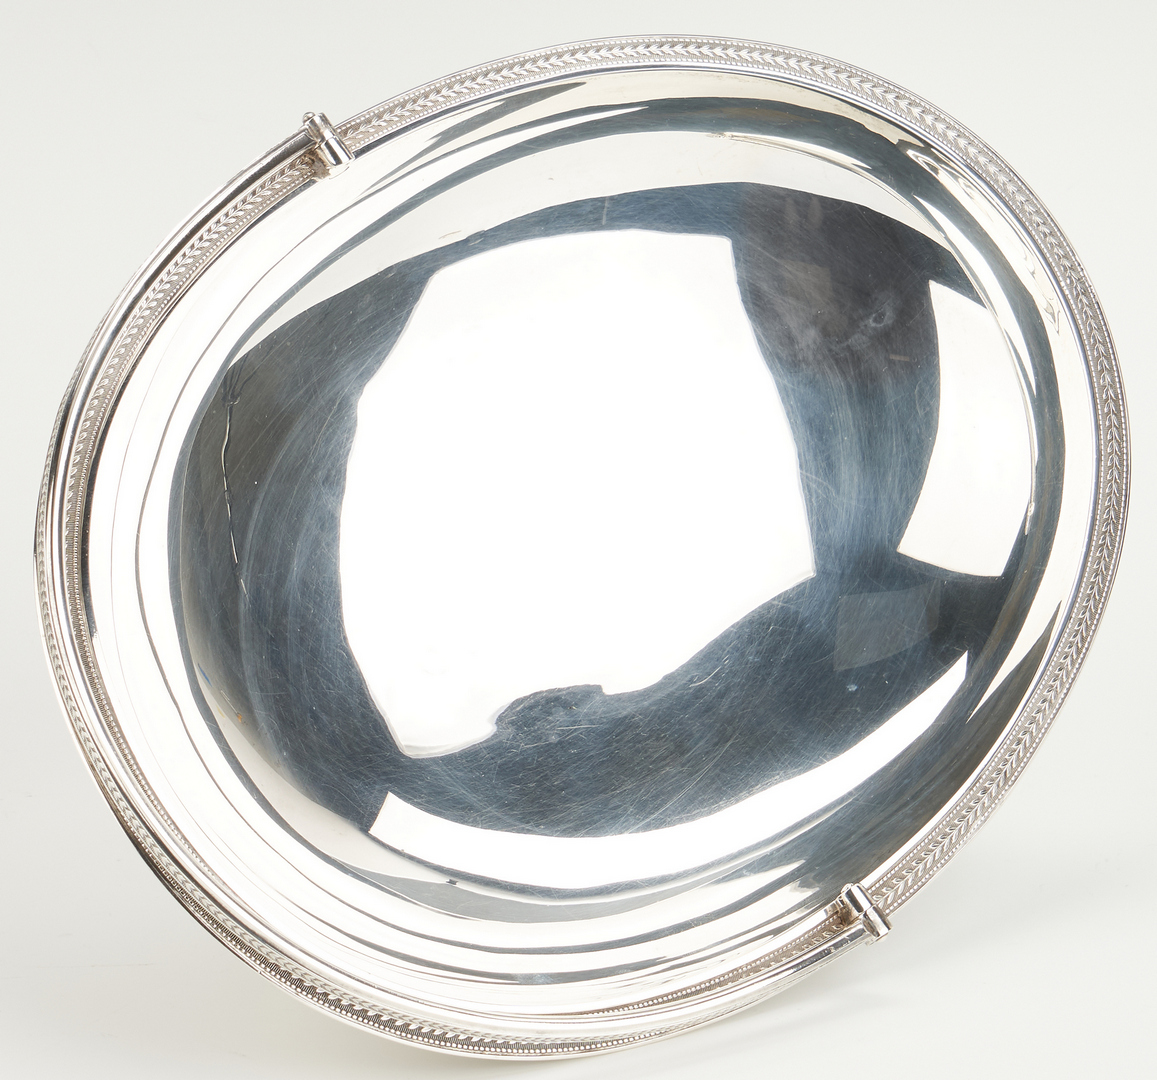 Lot 462: Sterling Silver Cake Basket, 19th c. Tiffany & Co. Mark